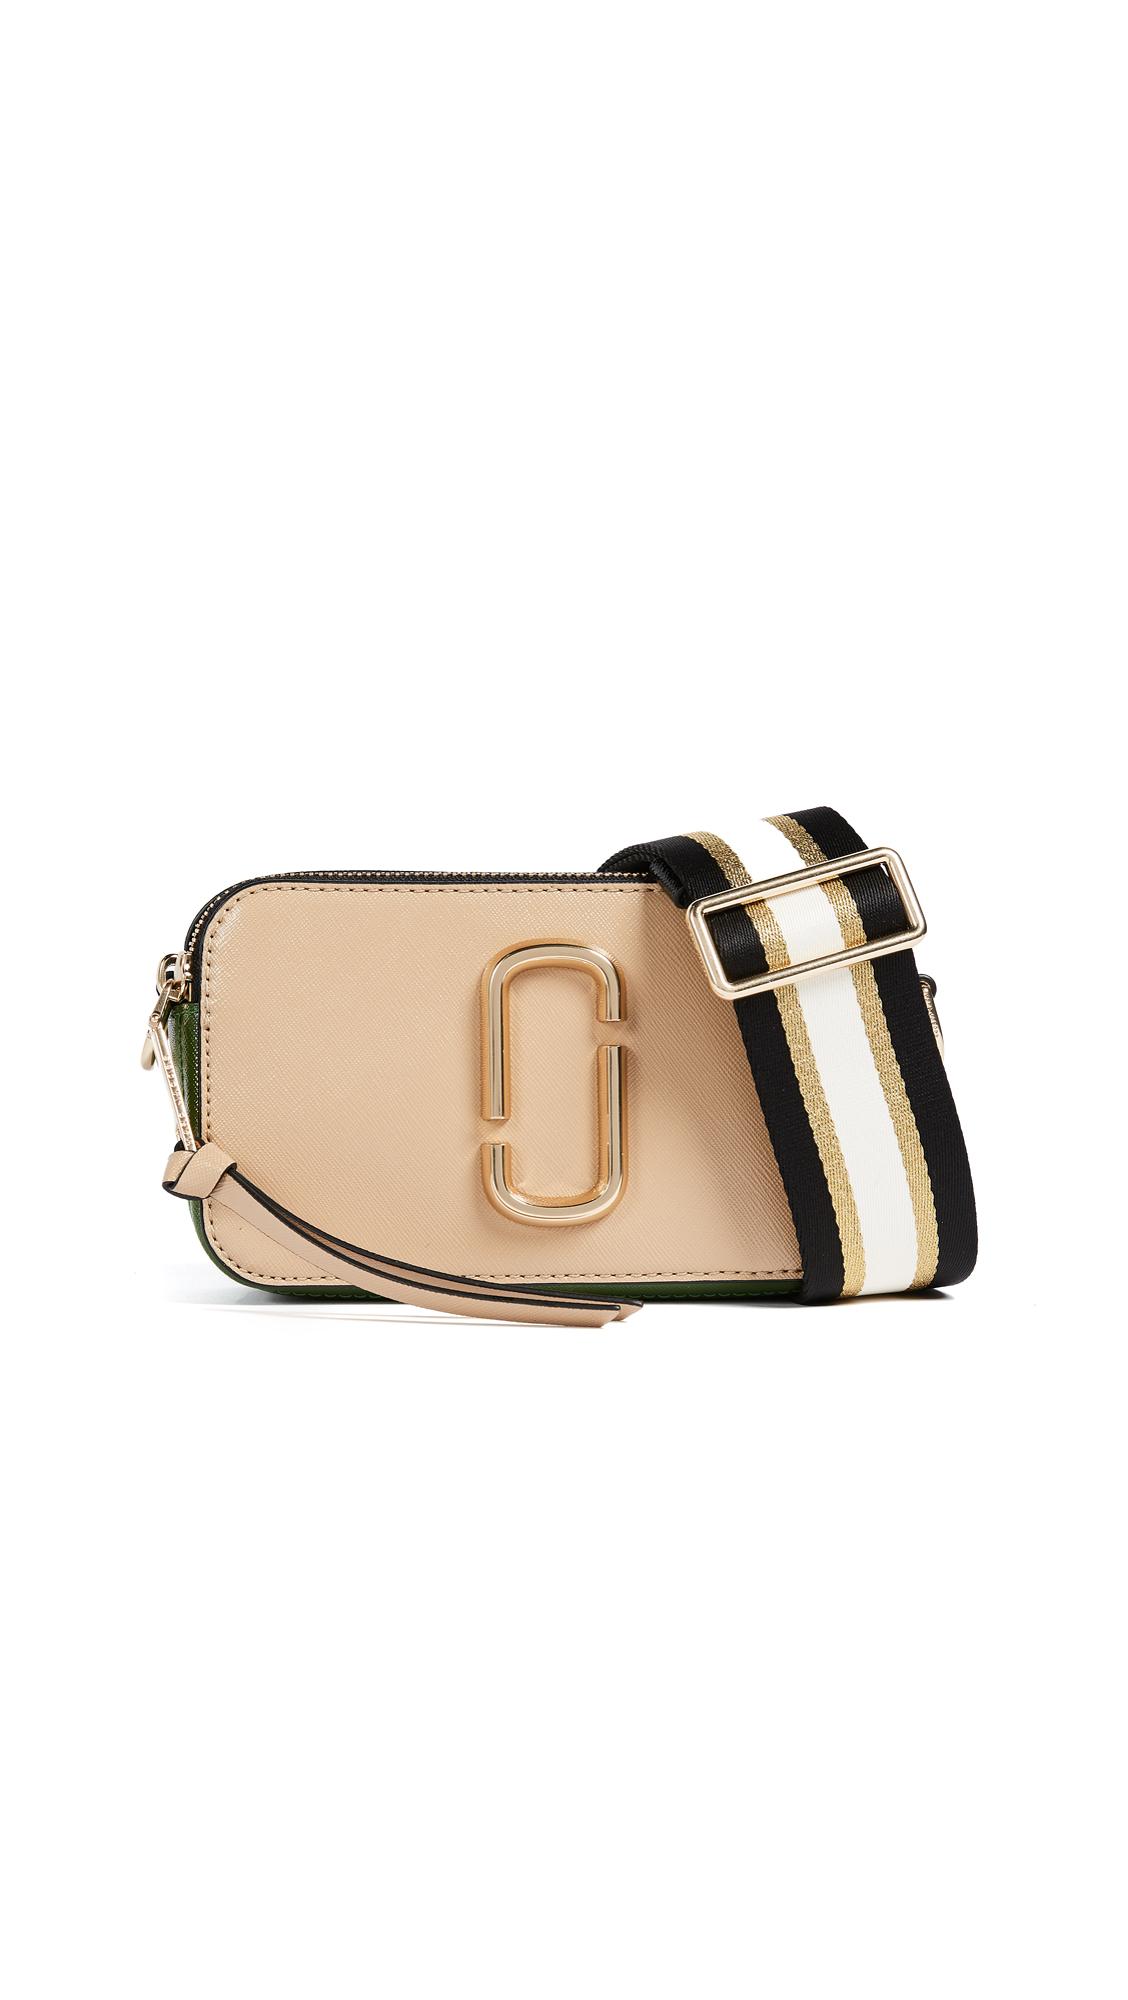 Marc Jacobs Snapshot Cross Body Bag - Sandcastle Multi